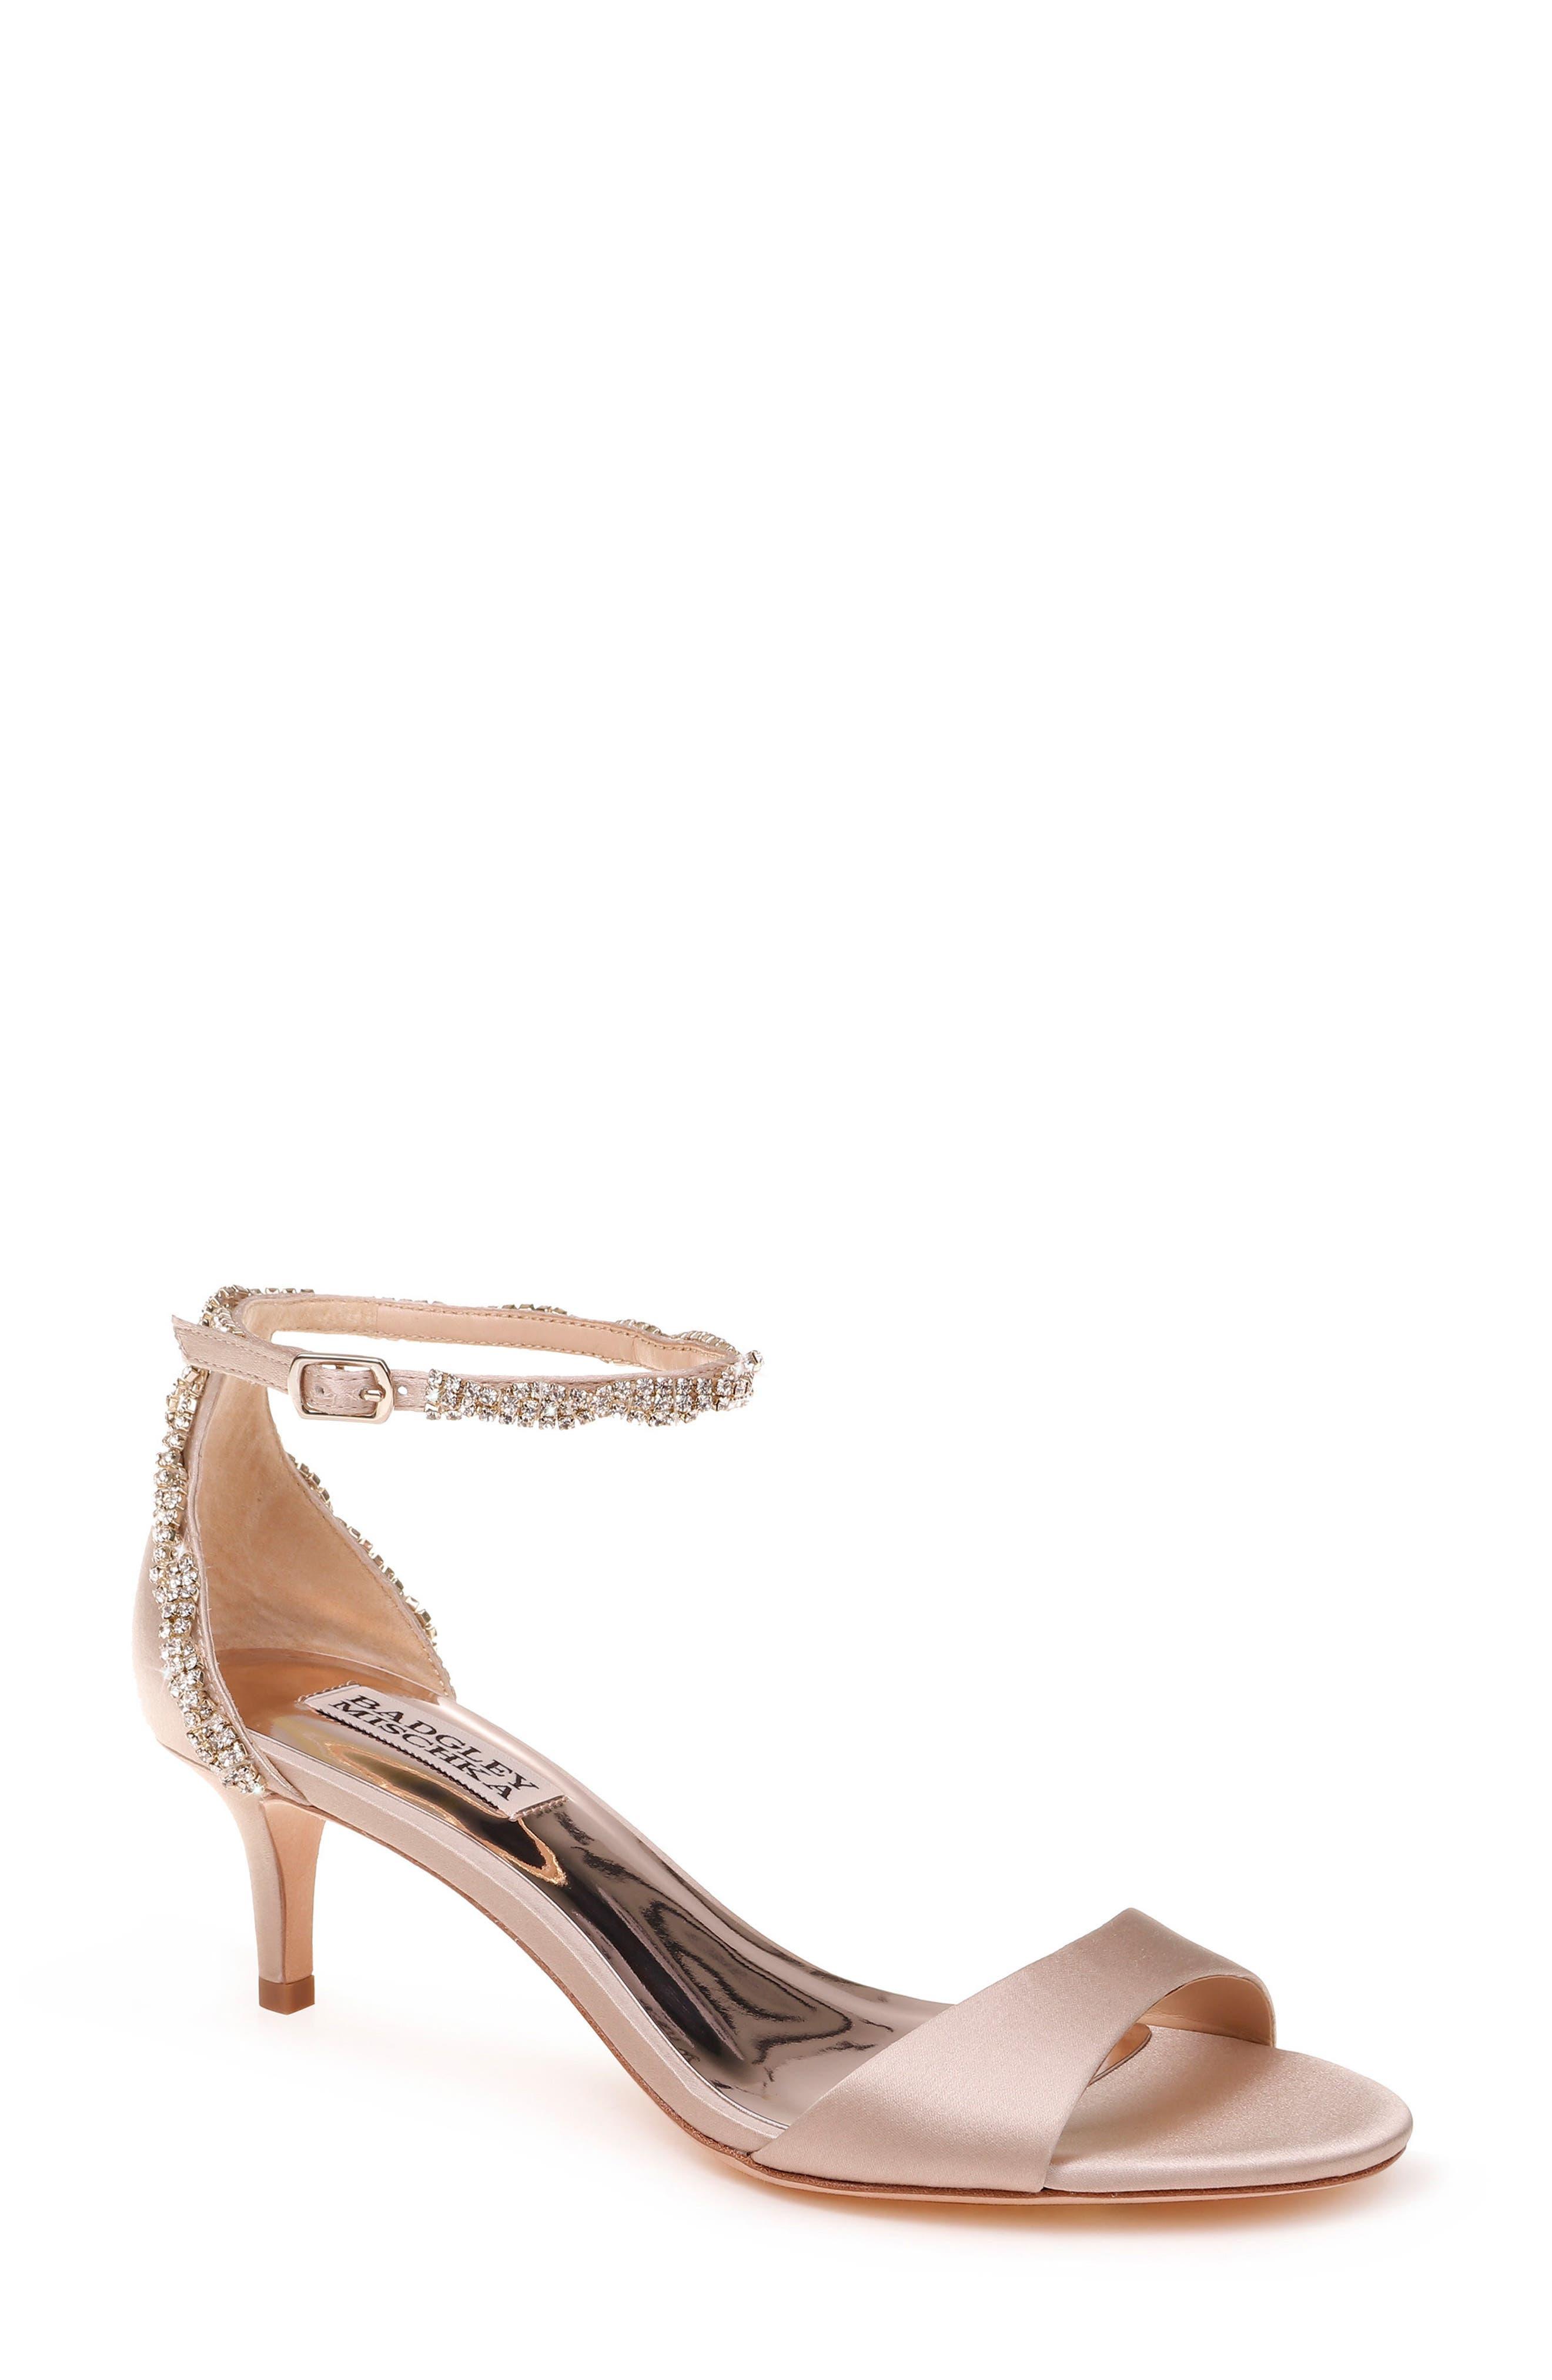 Yareli Crystal Embellished Sandal,                         Main,                         color, NUDE SATIN